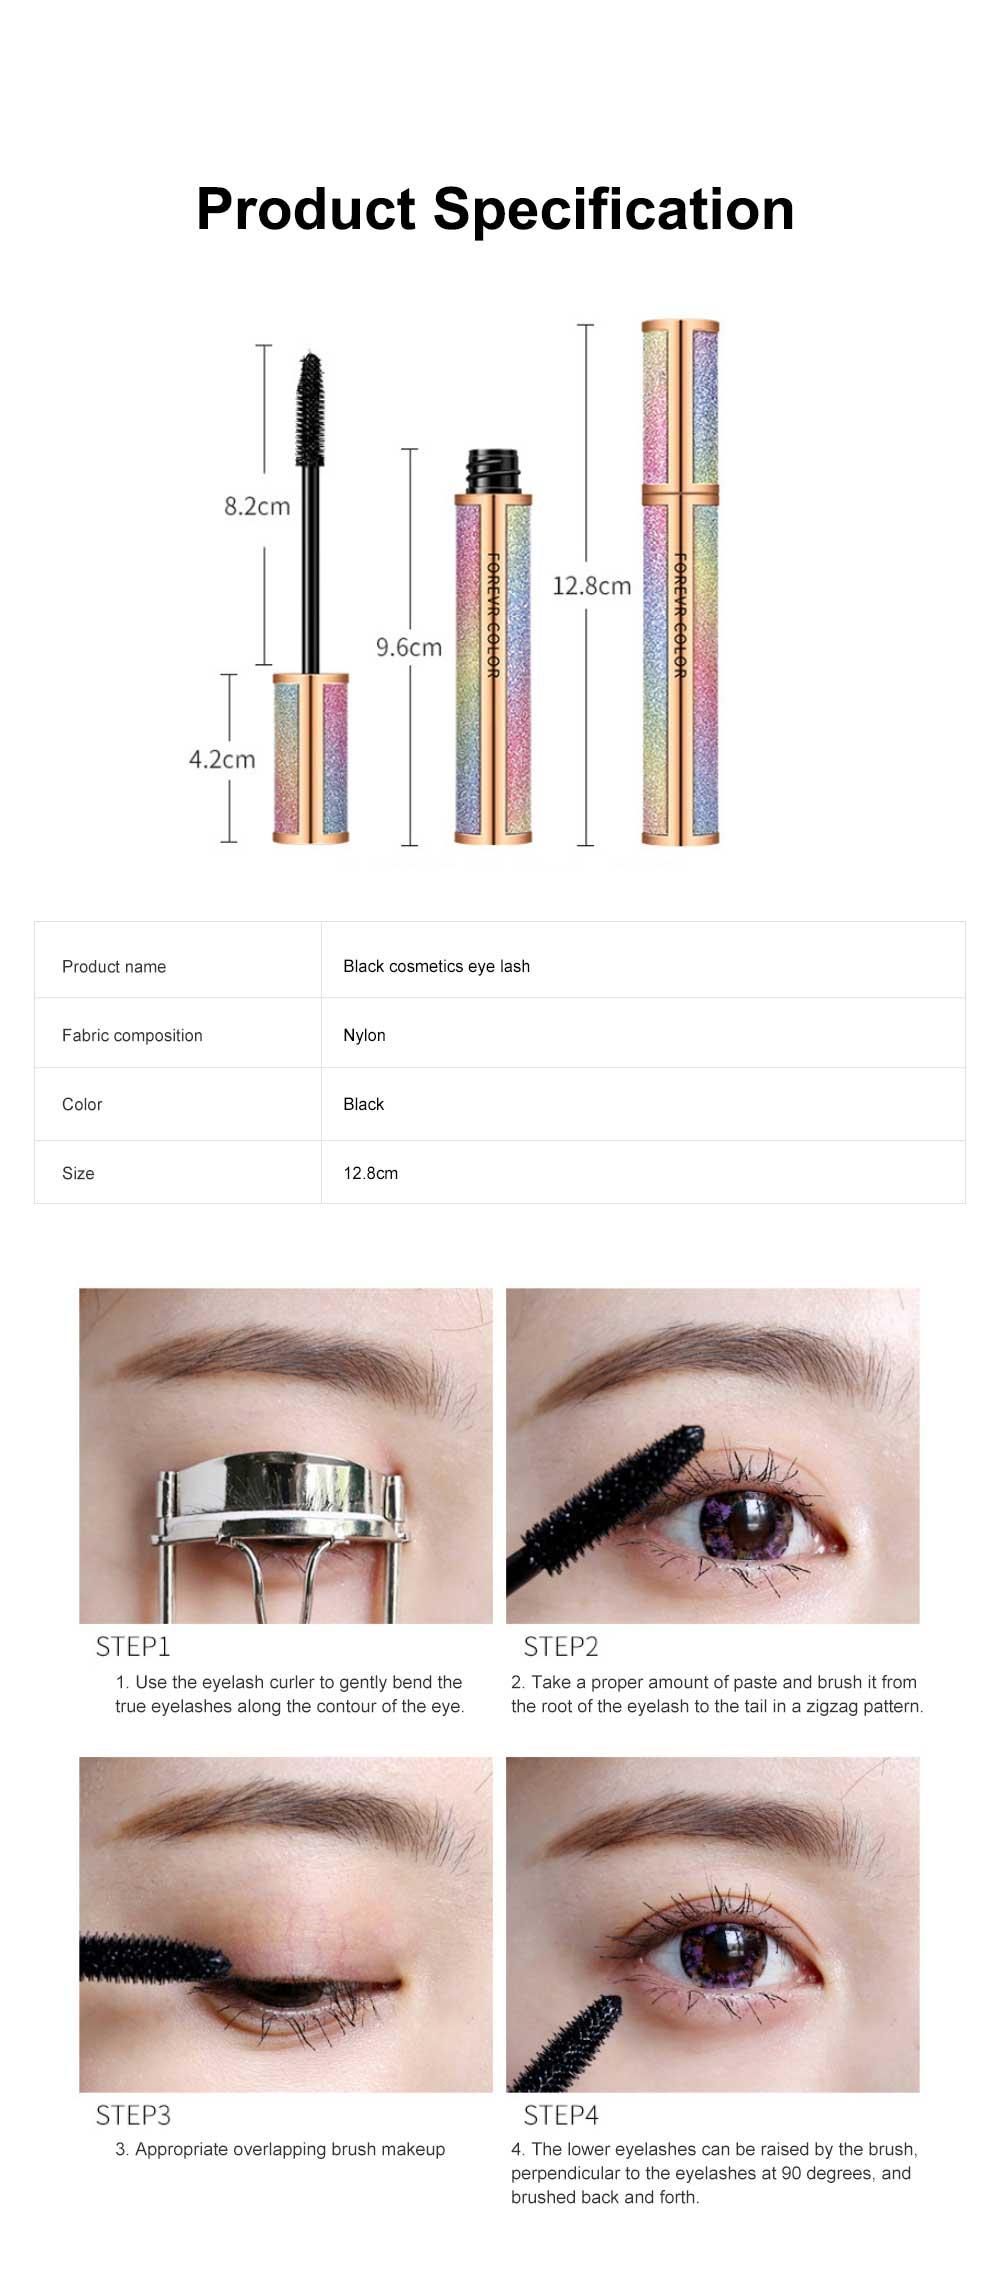 Makeup Cosmetics Eye Lash Black Waterproof Lasting Quick Dry Long And Curl Anti-sweat Easy Remove Fiber Mascara 6